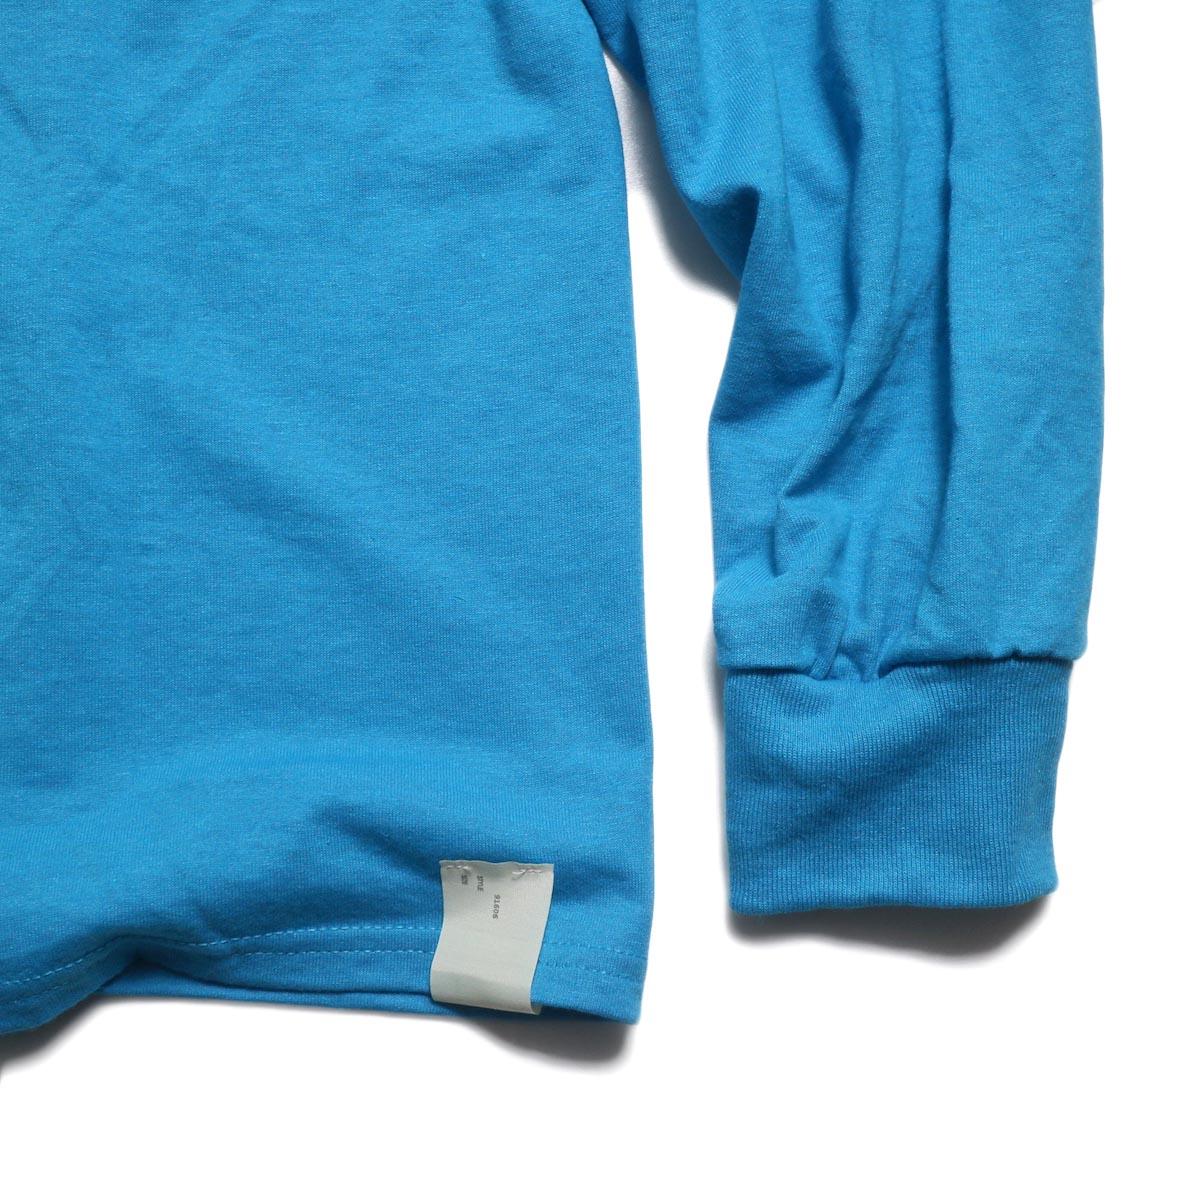 N.HOOLYWOOD × JERZEES  / 191-CS43-070 Long Sleeve Tee -Blue タグ